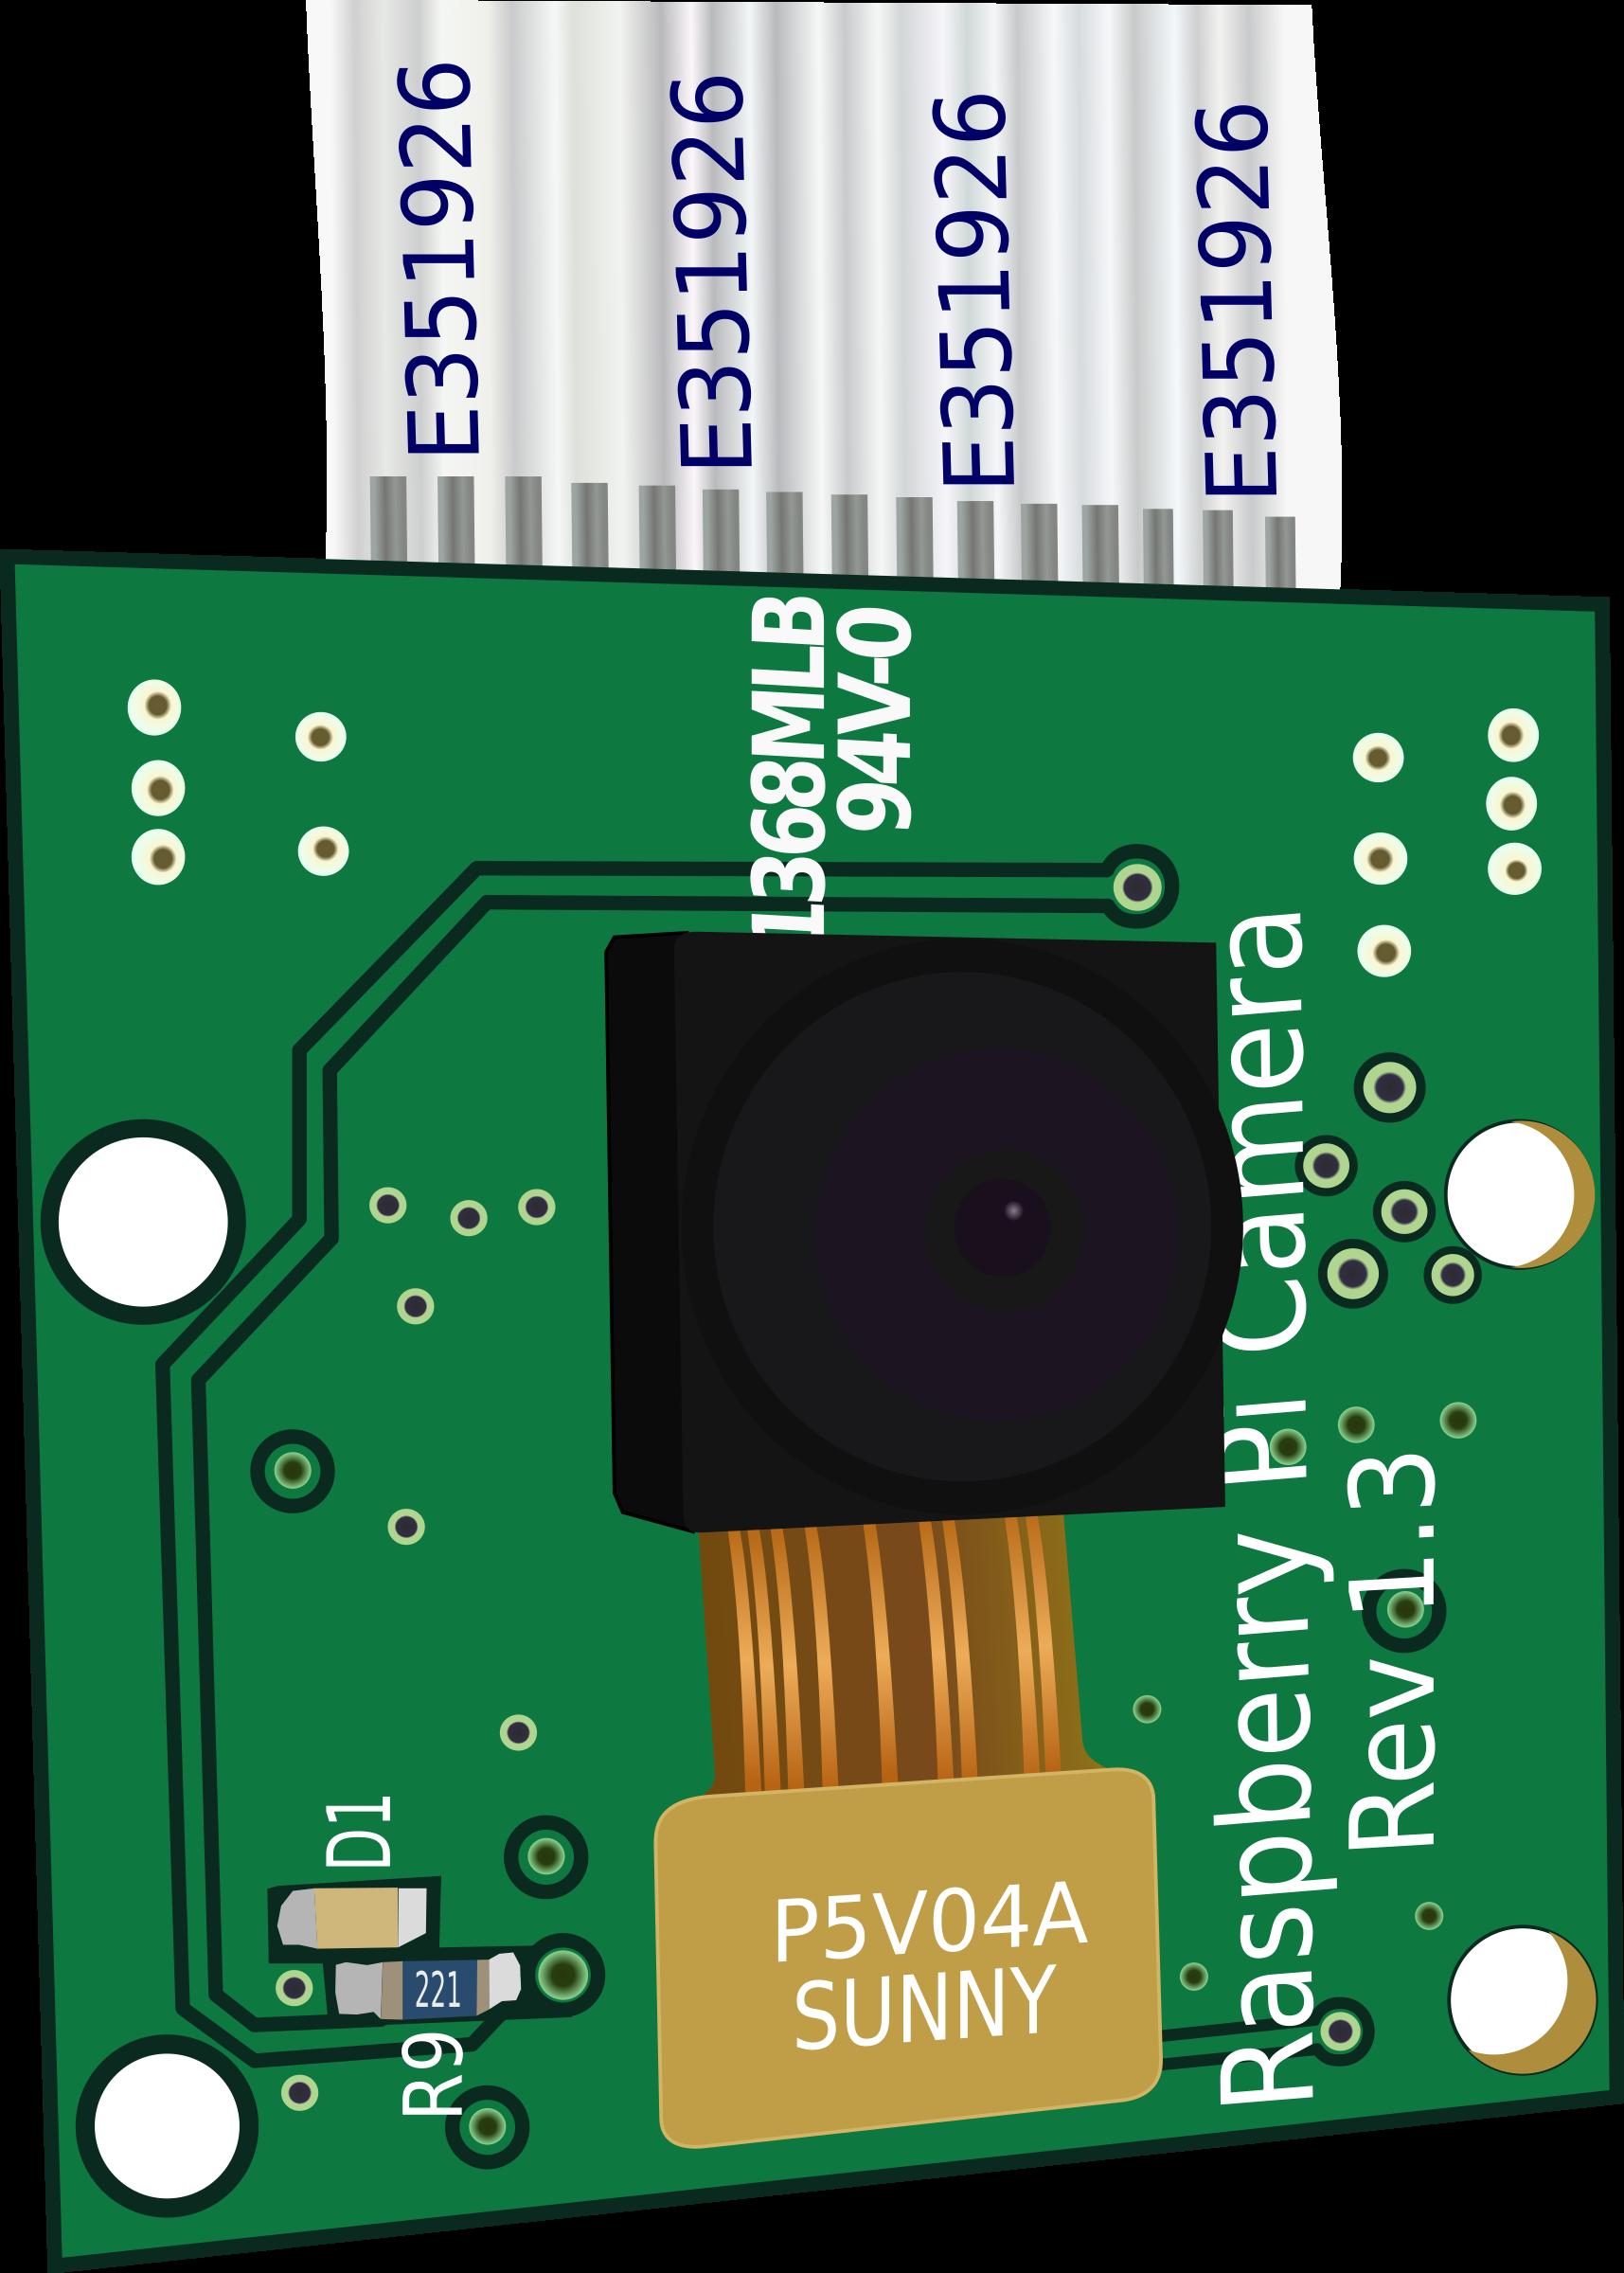 Raspberry pi 2 clipart picture Clipart - Raspberry Pi Camera picture